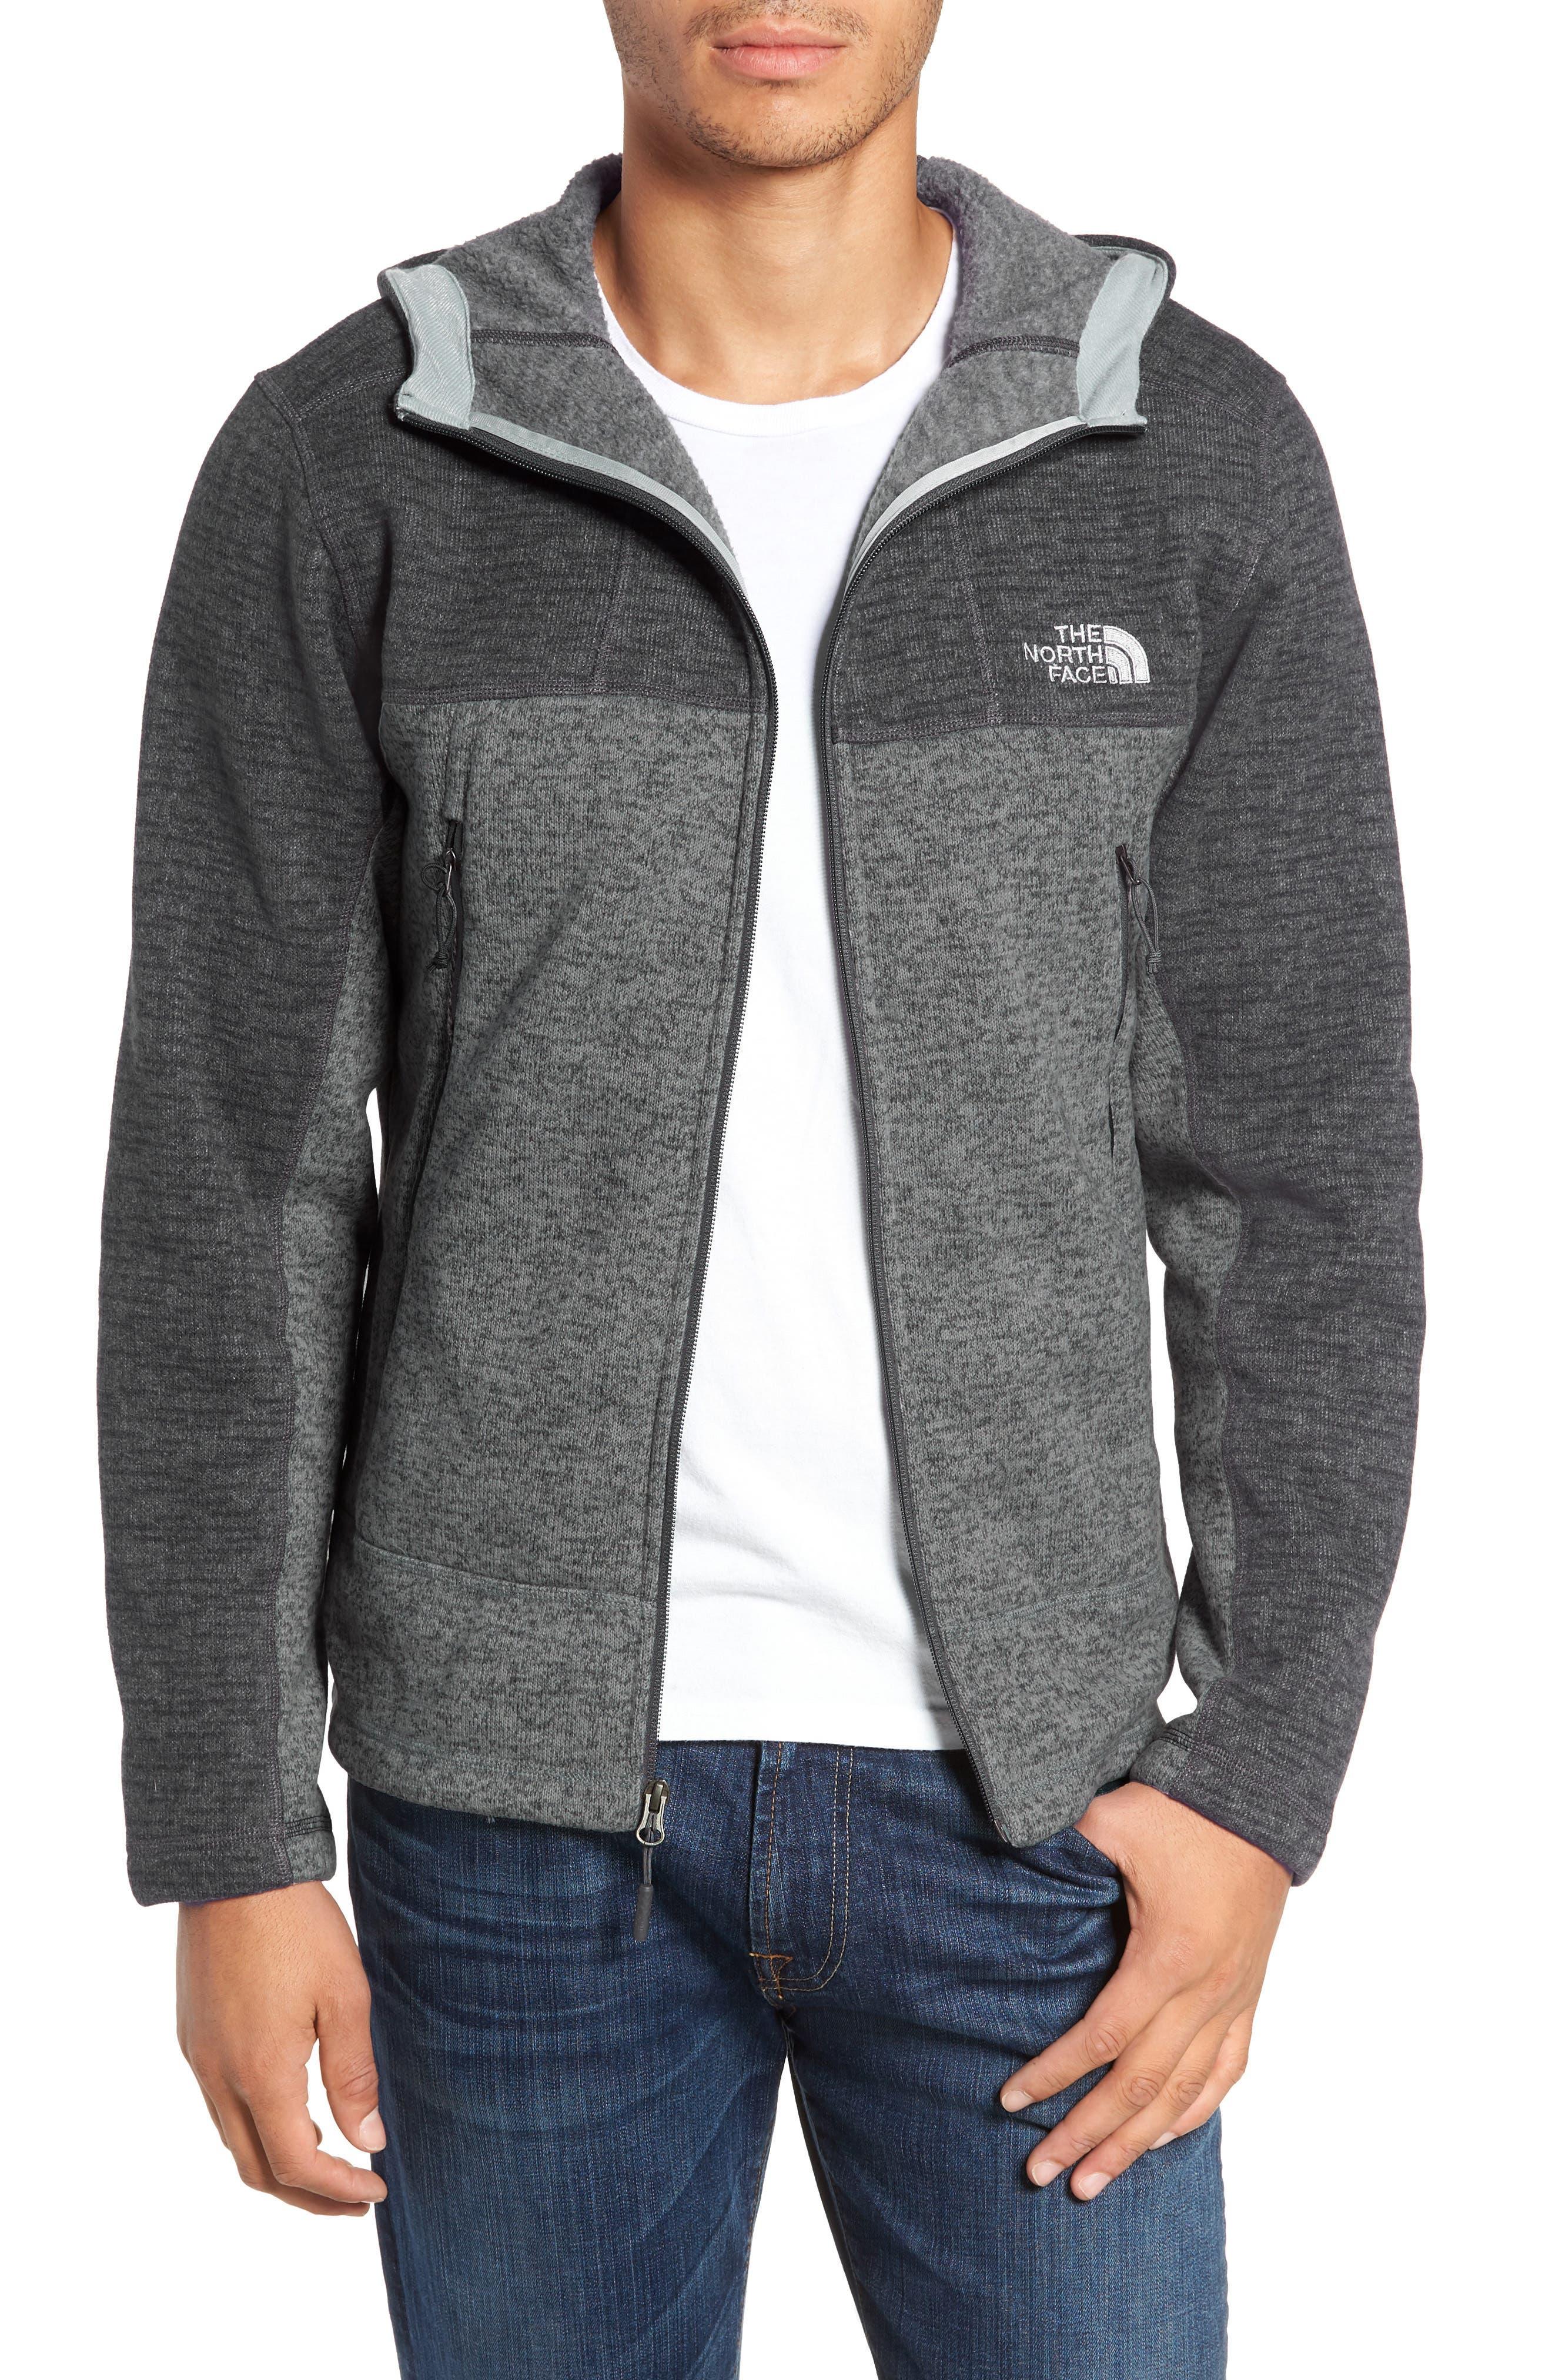 Gordon Lyons Alpine Sweater Fleece Hoodie,                             Alternate thumbnail 4, color,                             ASPHALT GREY/ MONUMENT GREY